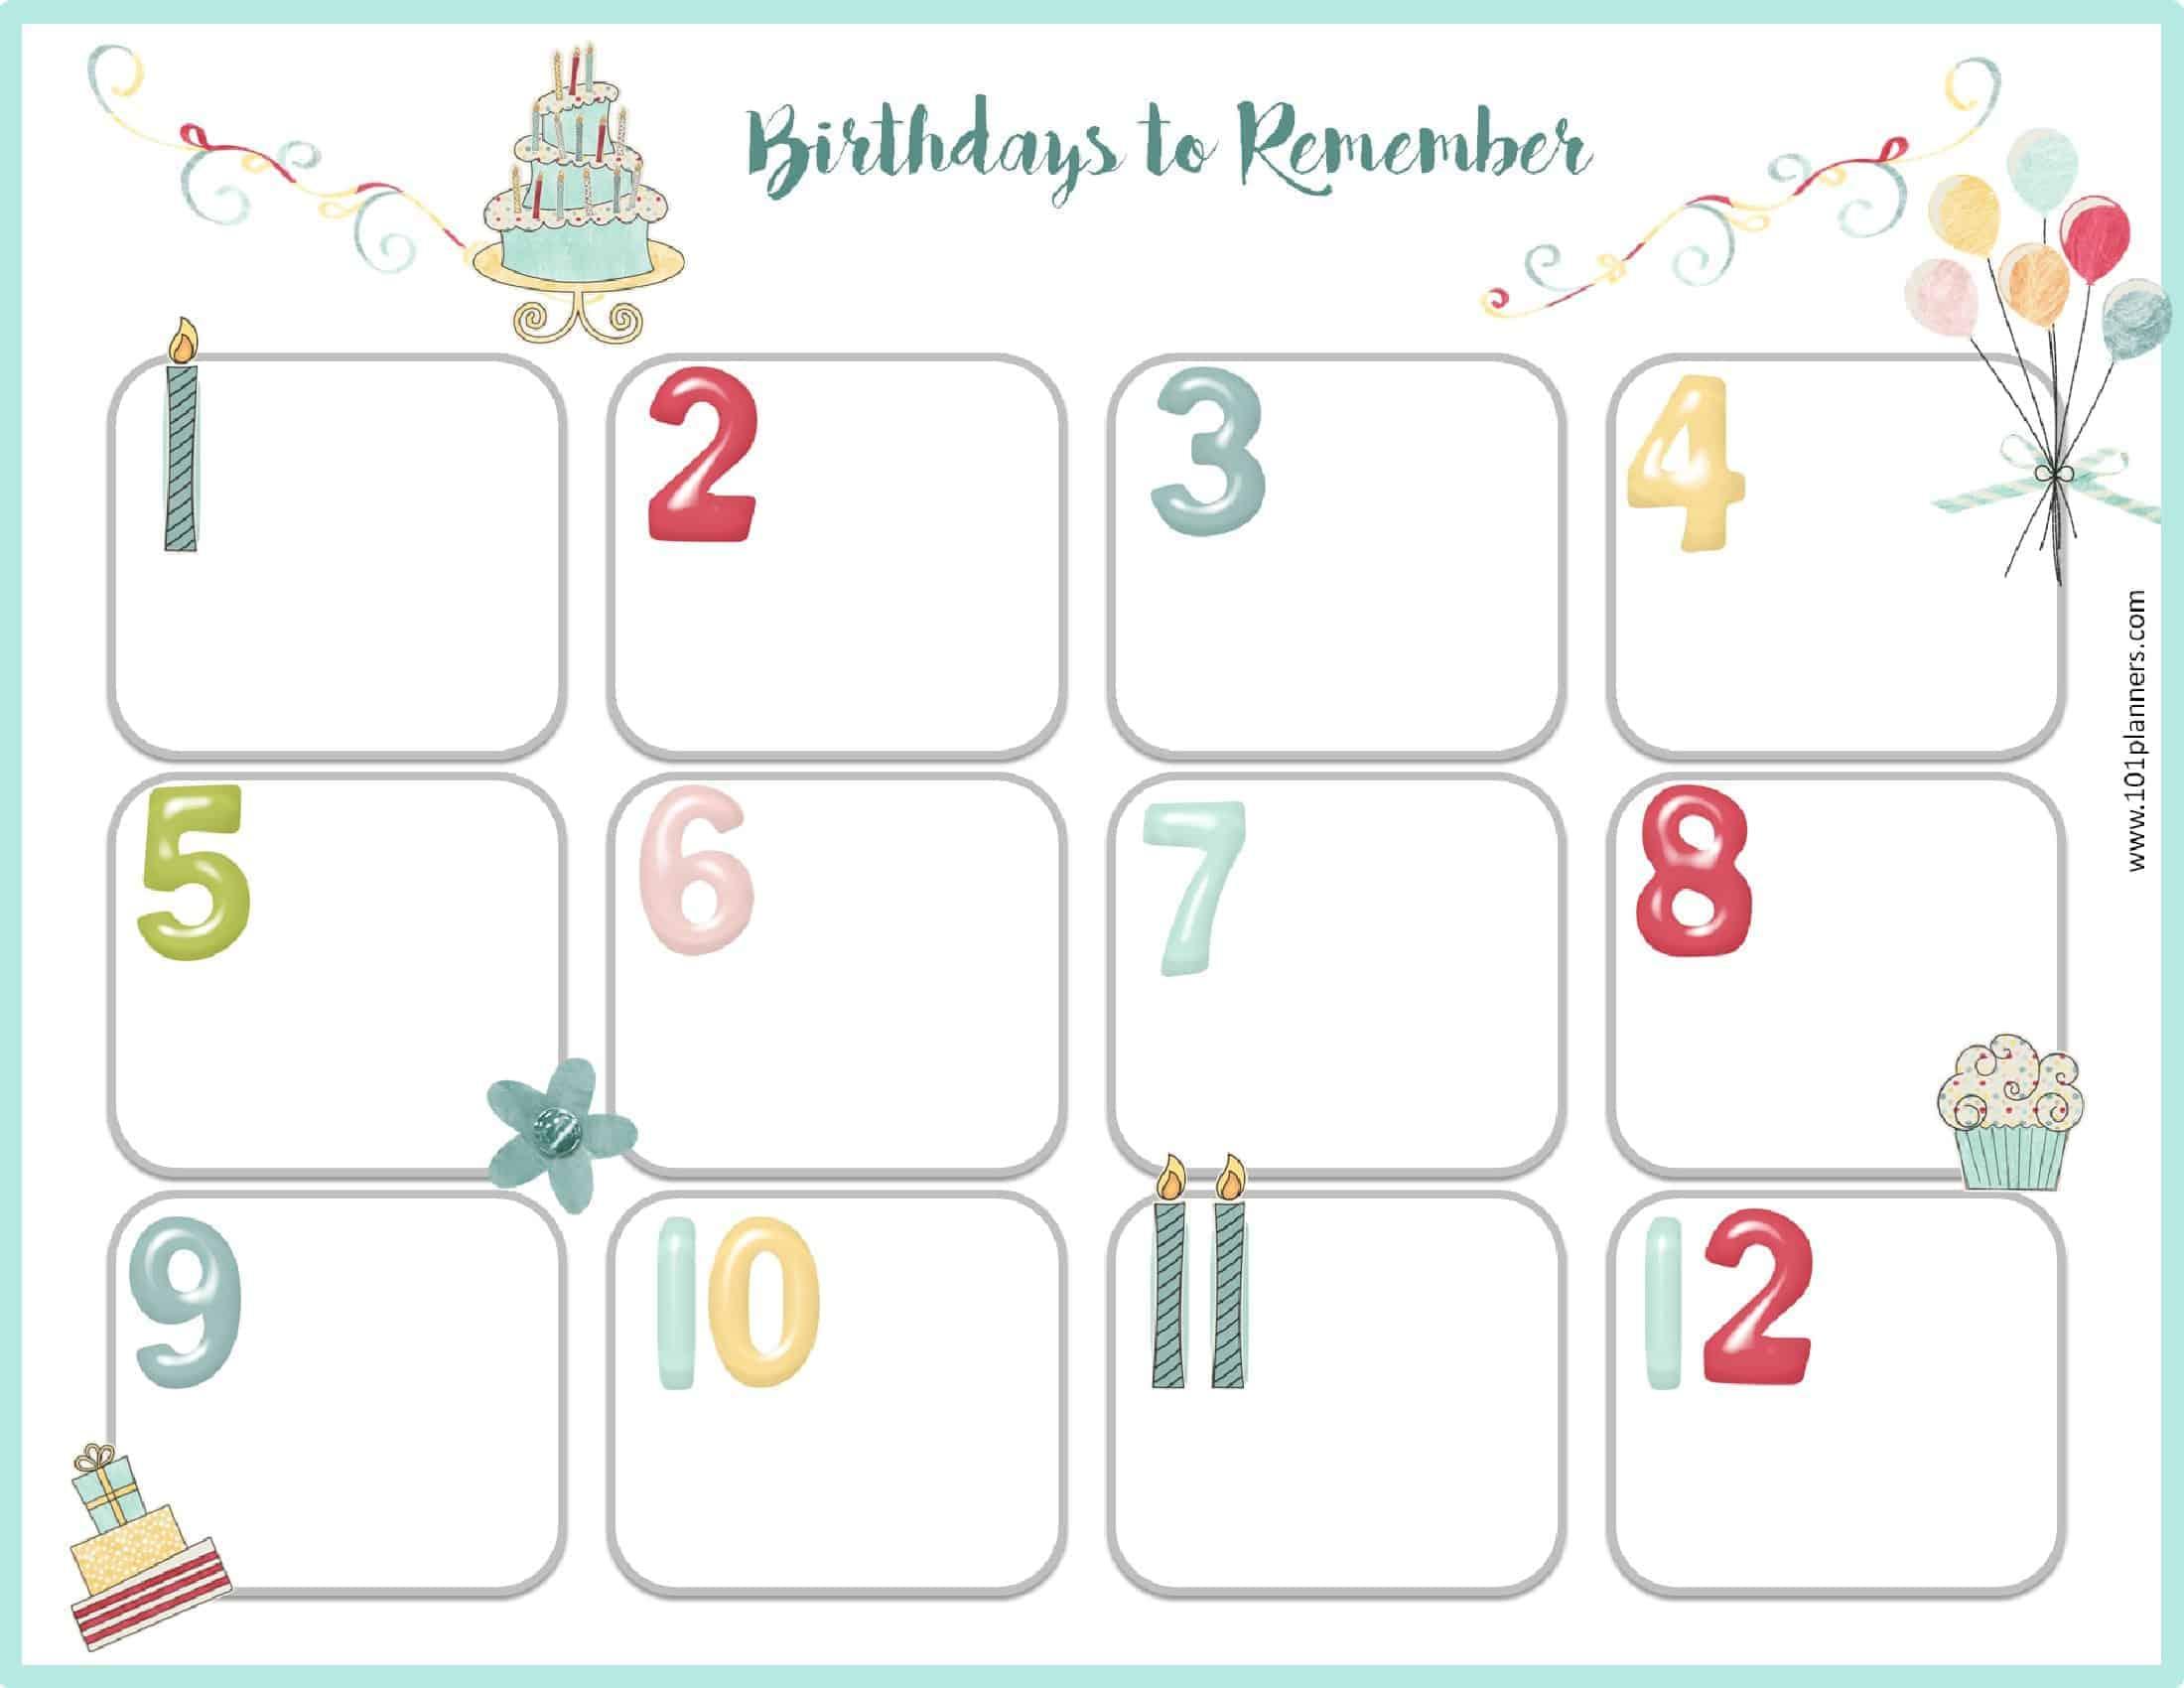 Birthday Calendar Template within Classroom Birthday Calendar Template